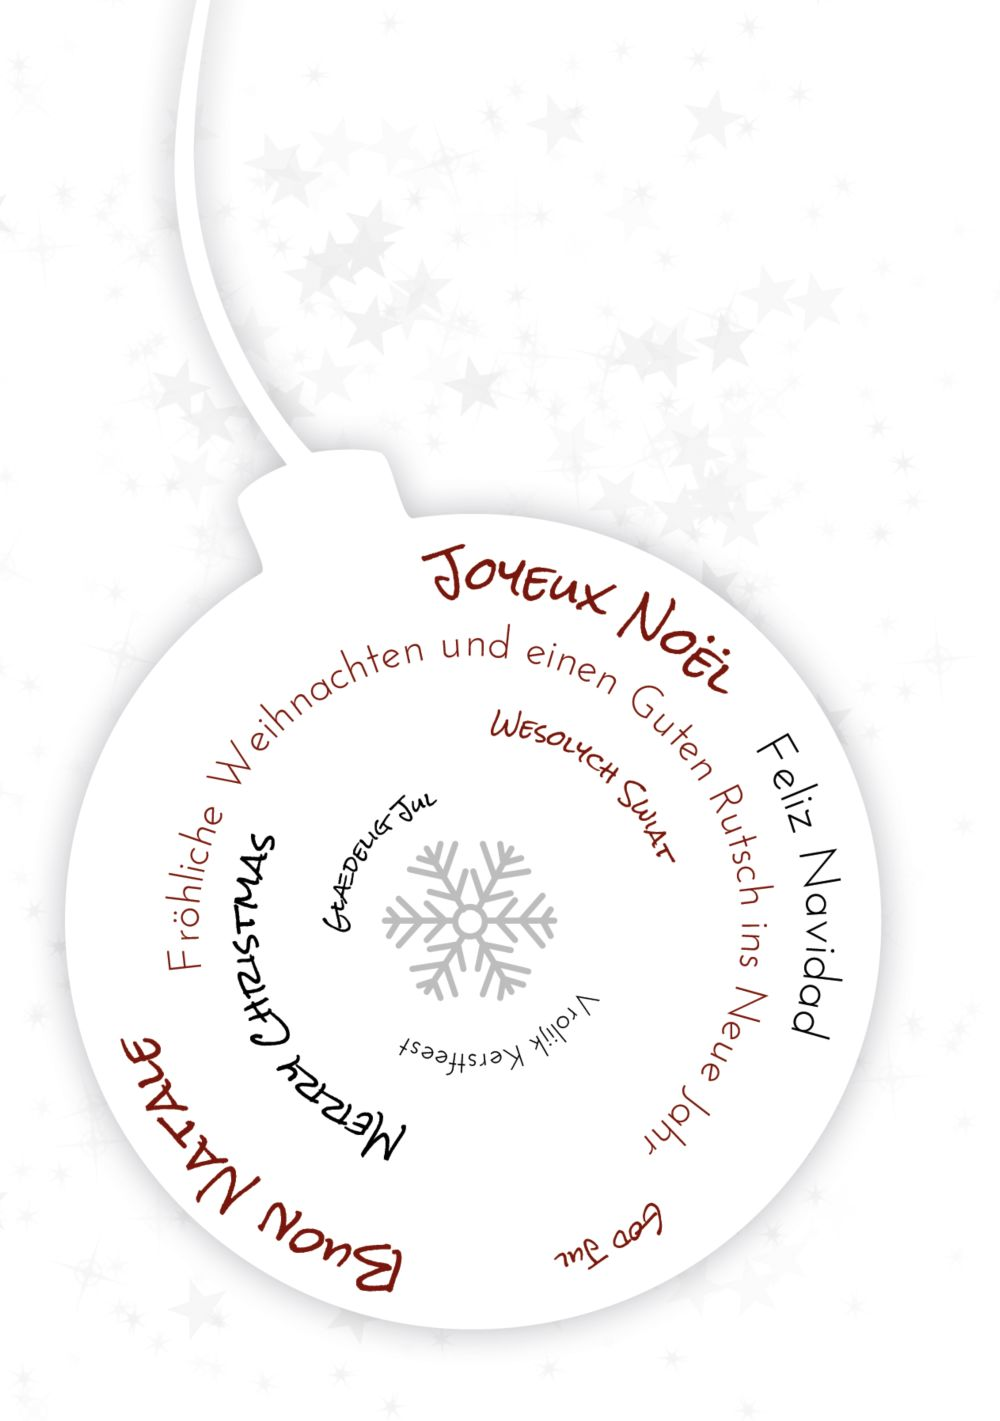 Ansicht 3 - Grußkarte Schriftkugel